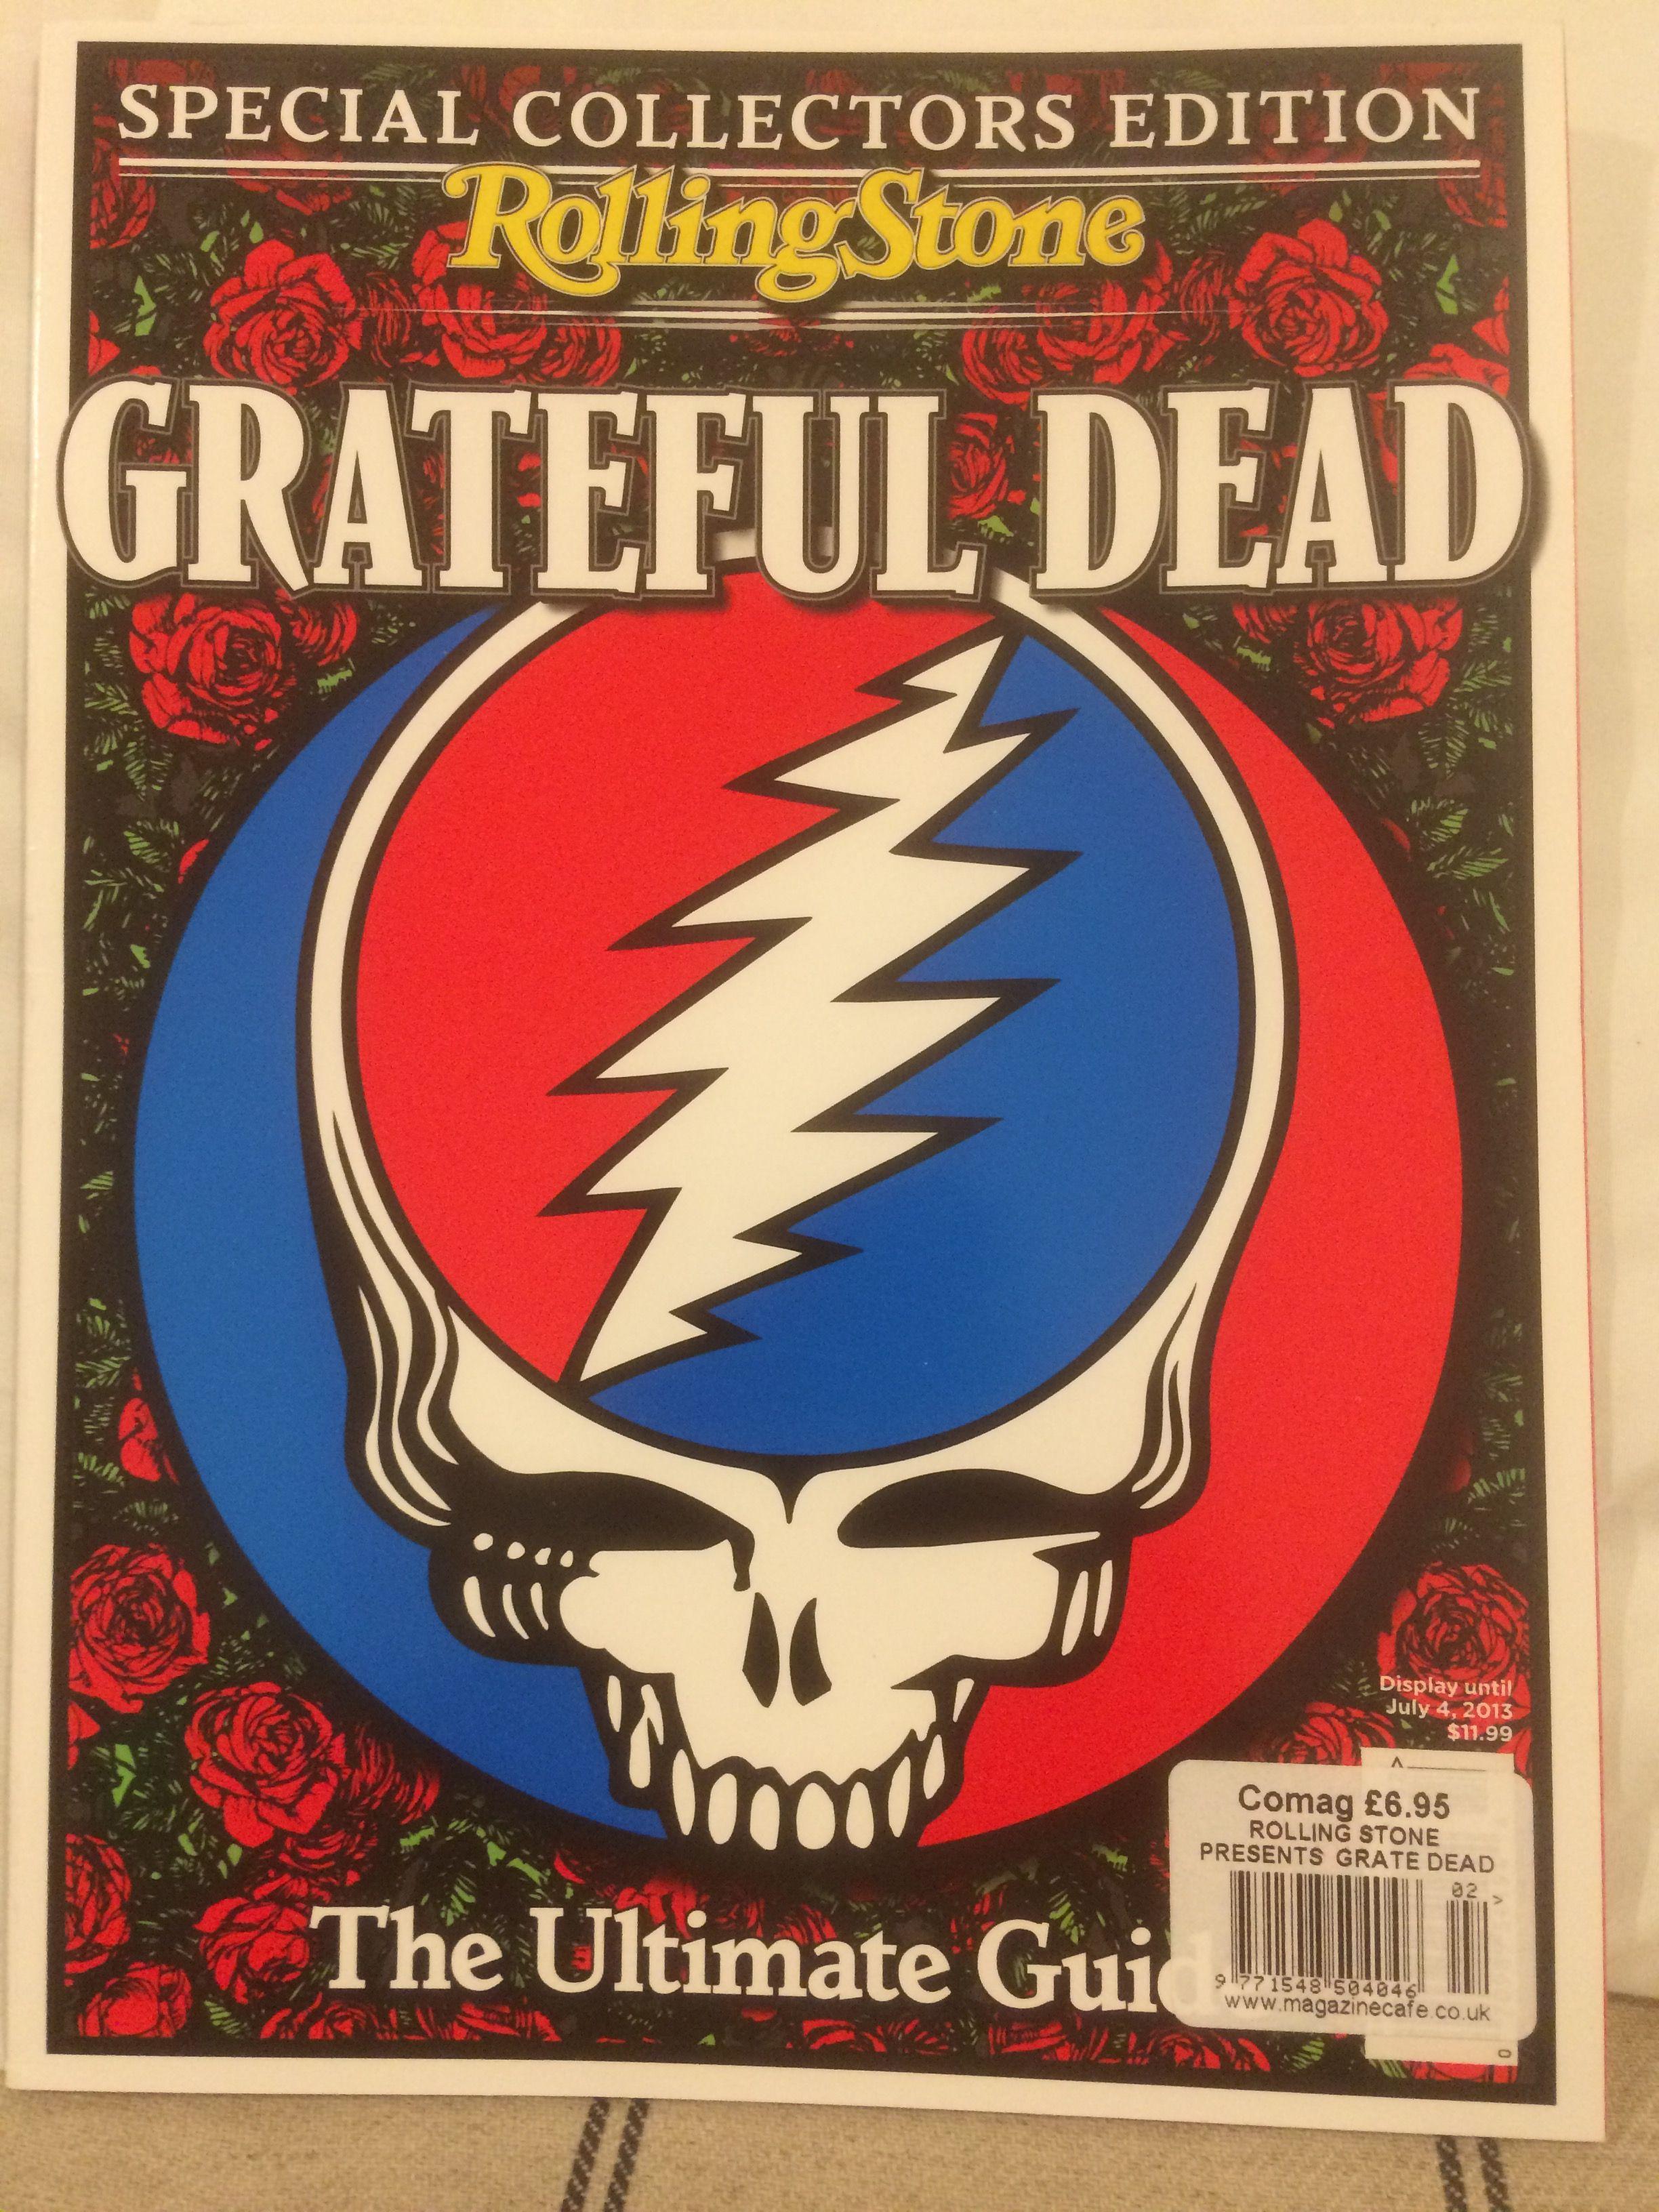 Pin By Robert M Wenzel On Grateful Dead Grateful Dead Rolling